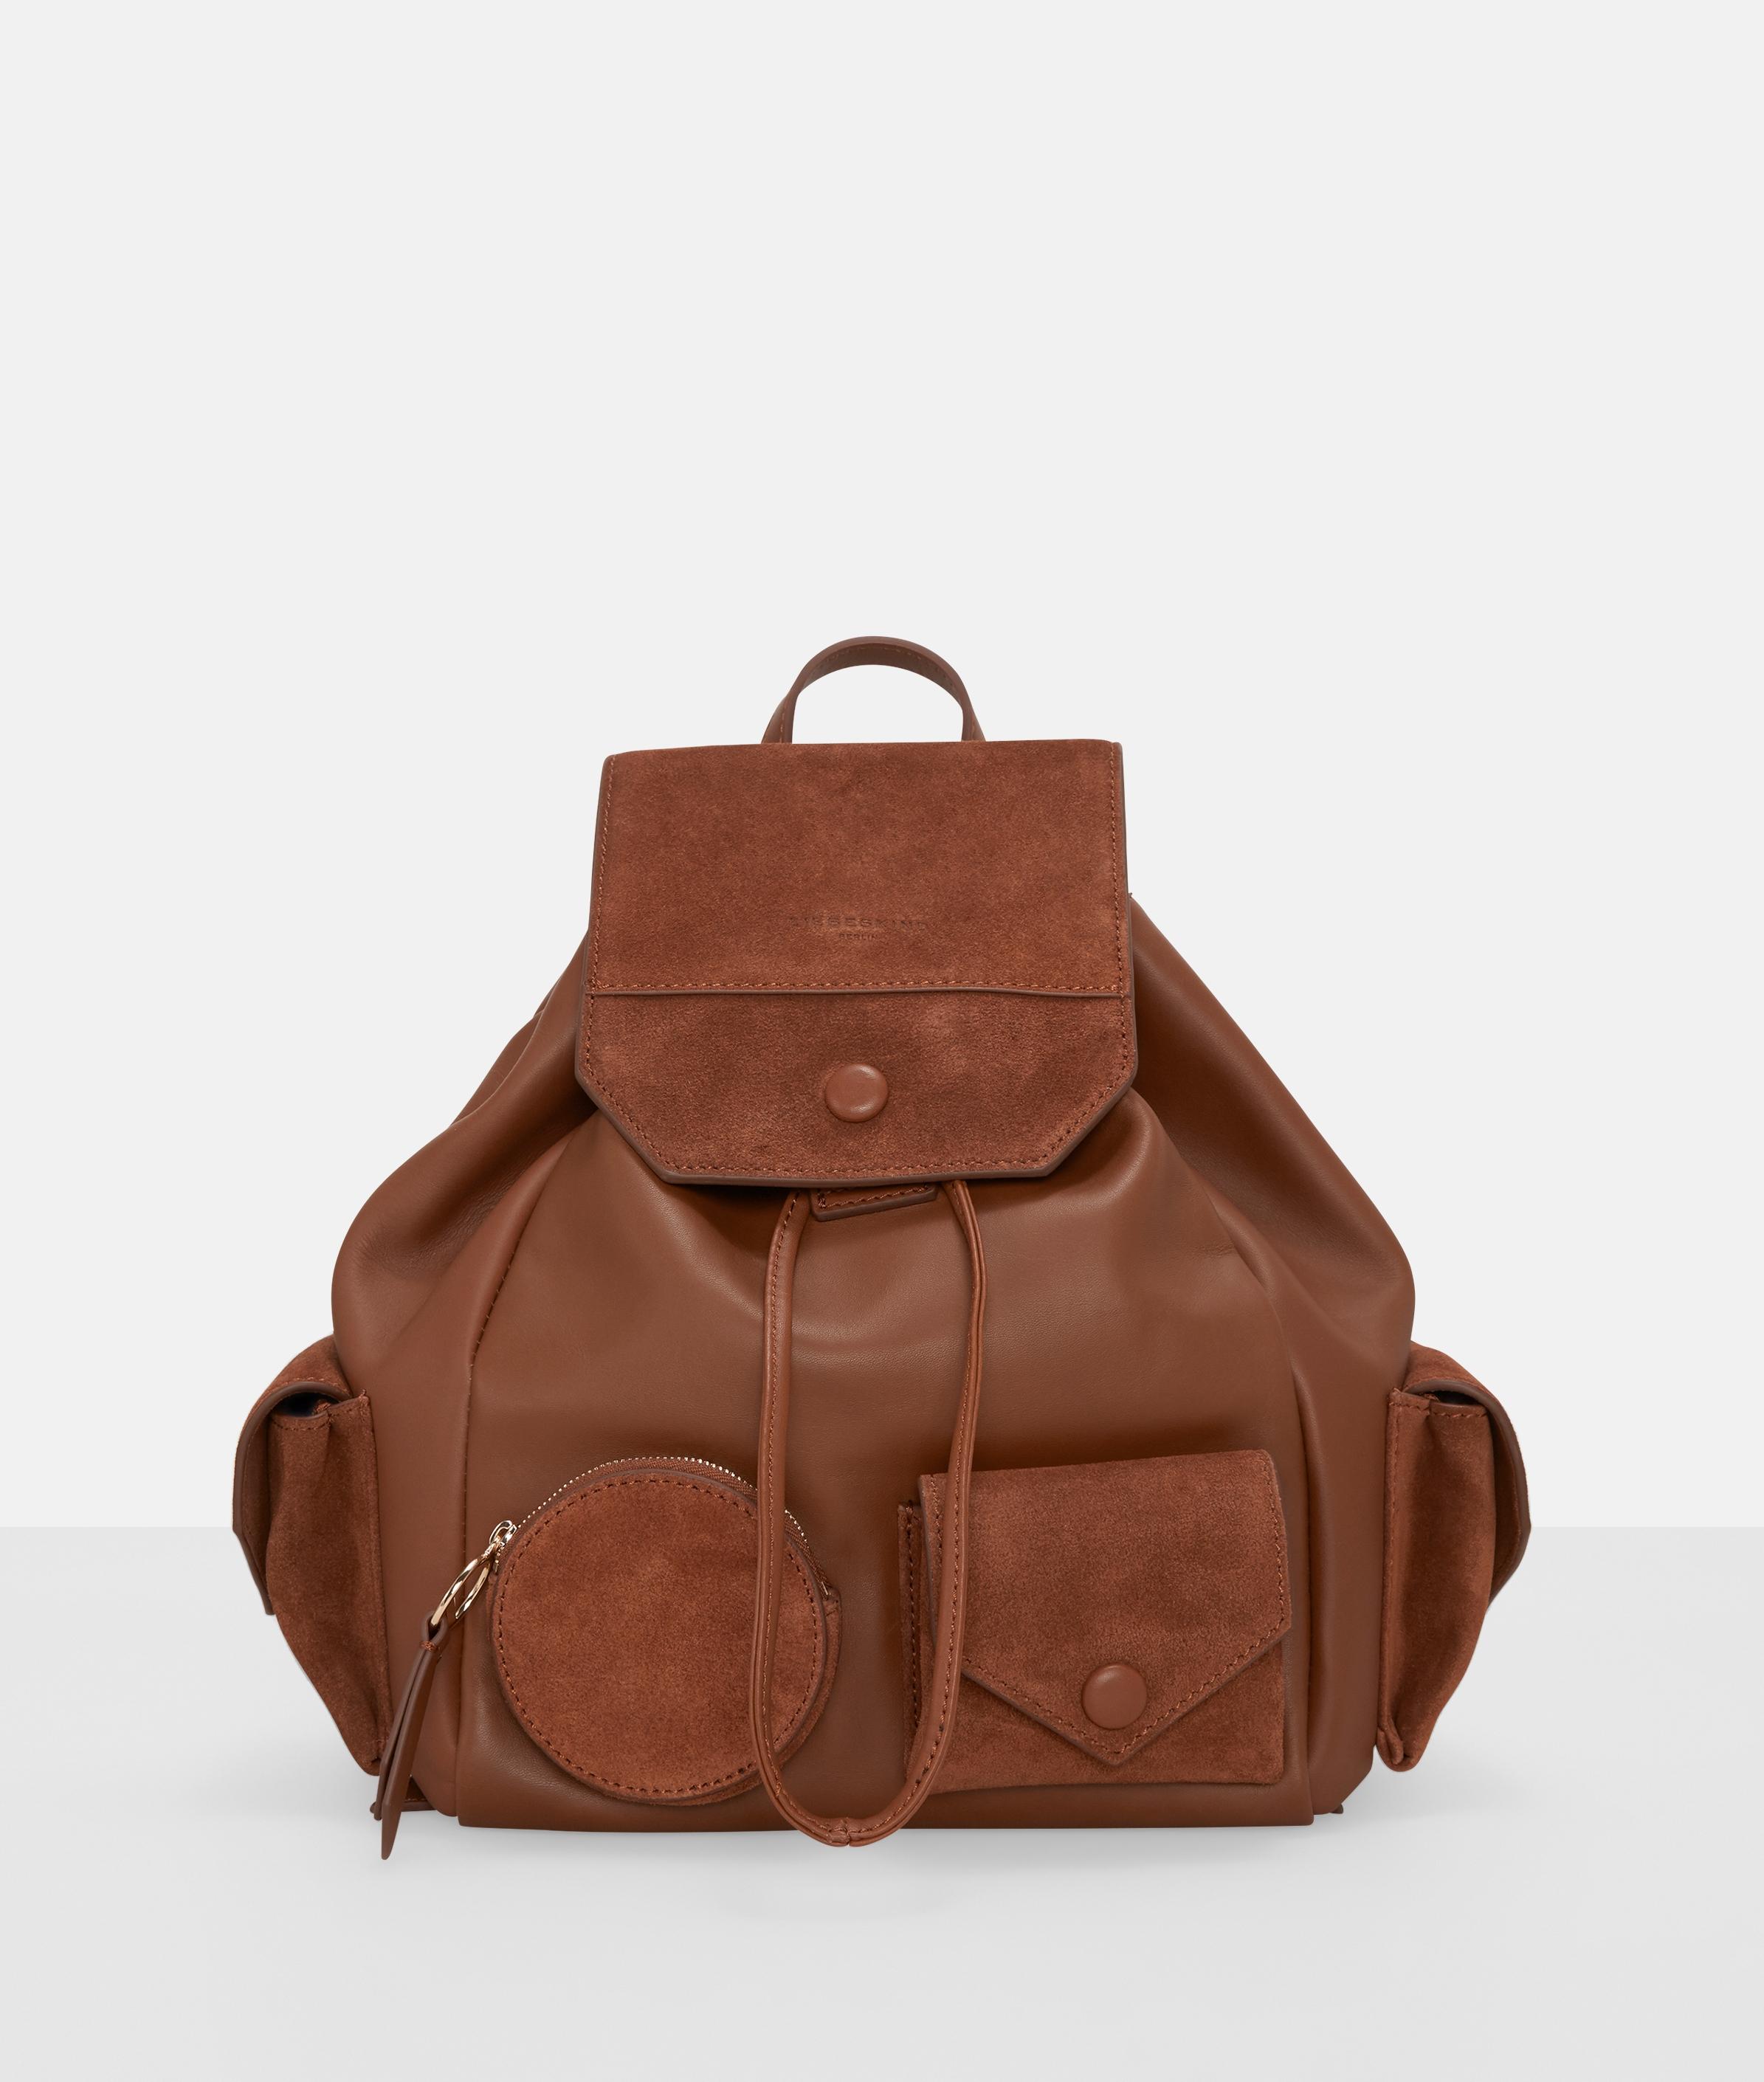 Berlin Tasche Casual Pocket Backpack M, Braun